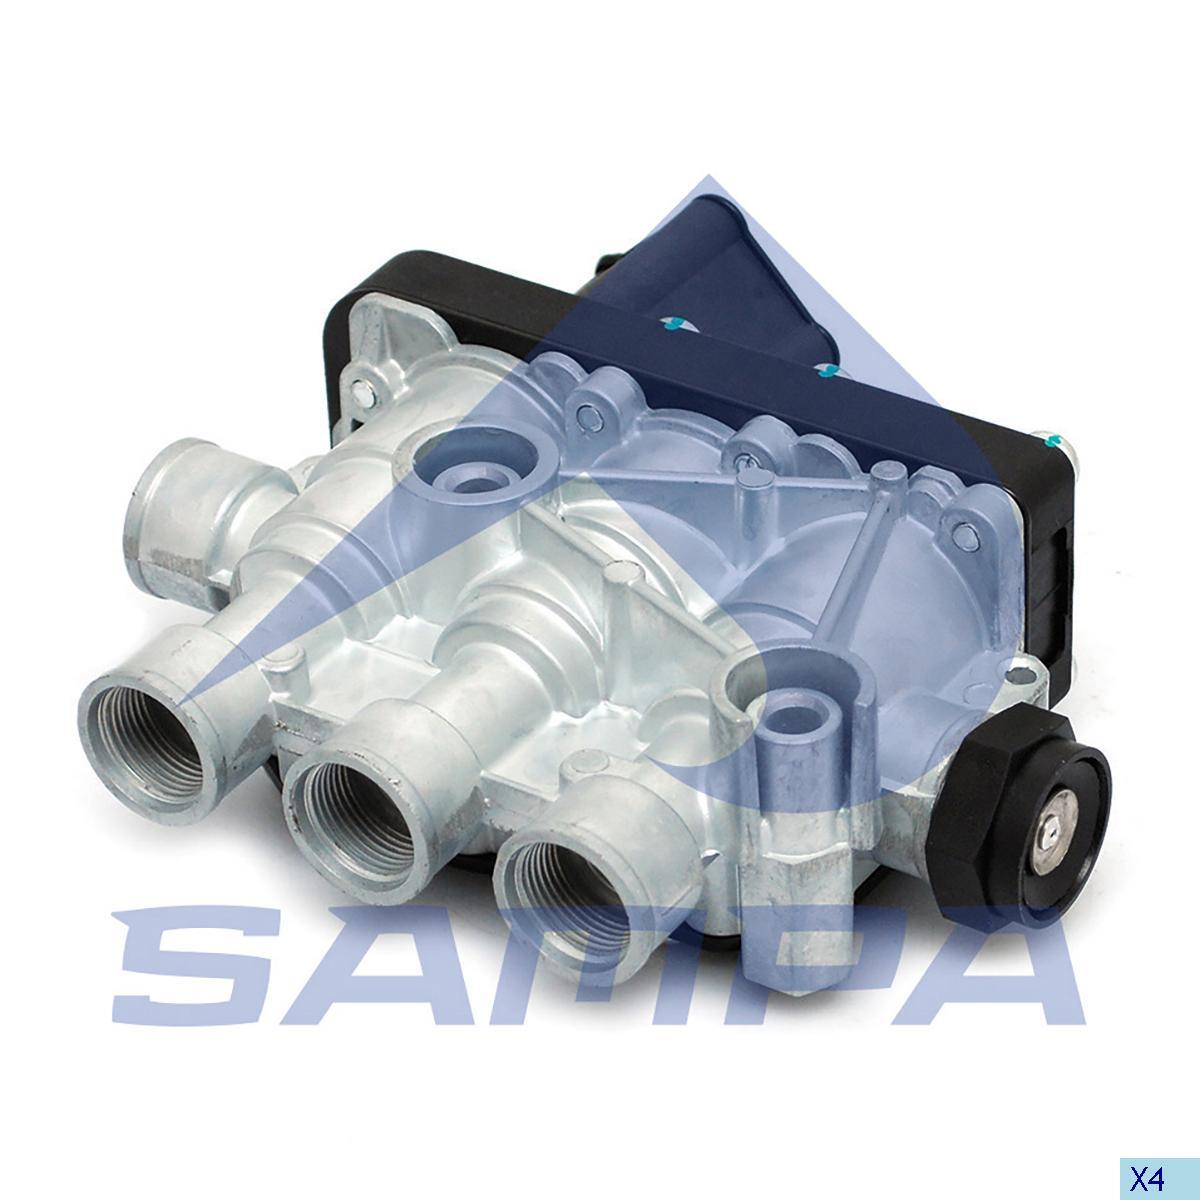 Solenoid Valve, Mercedes, Compressed Air System